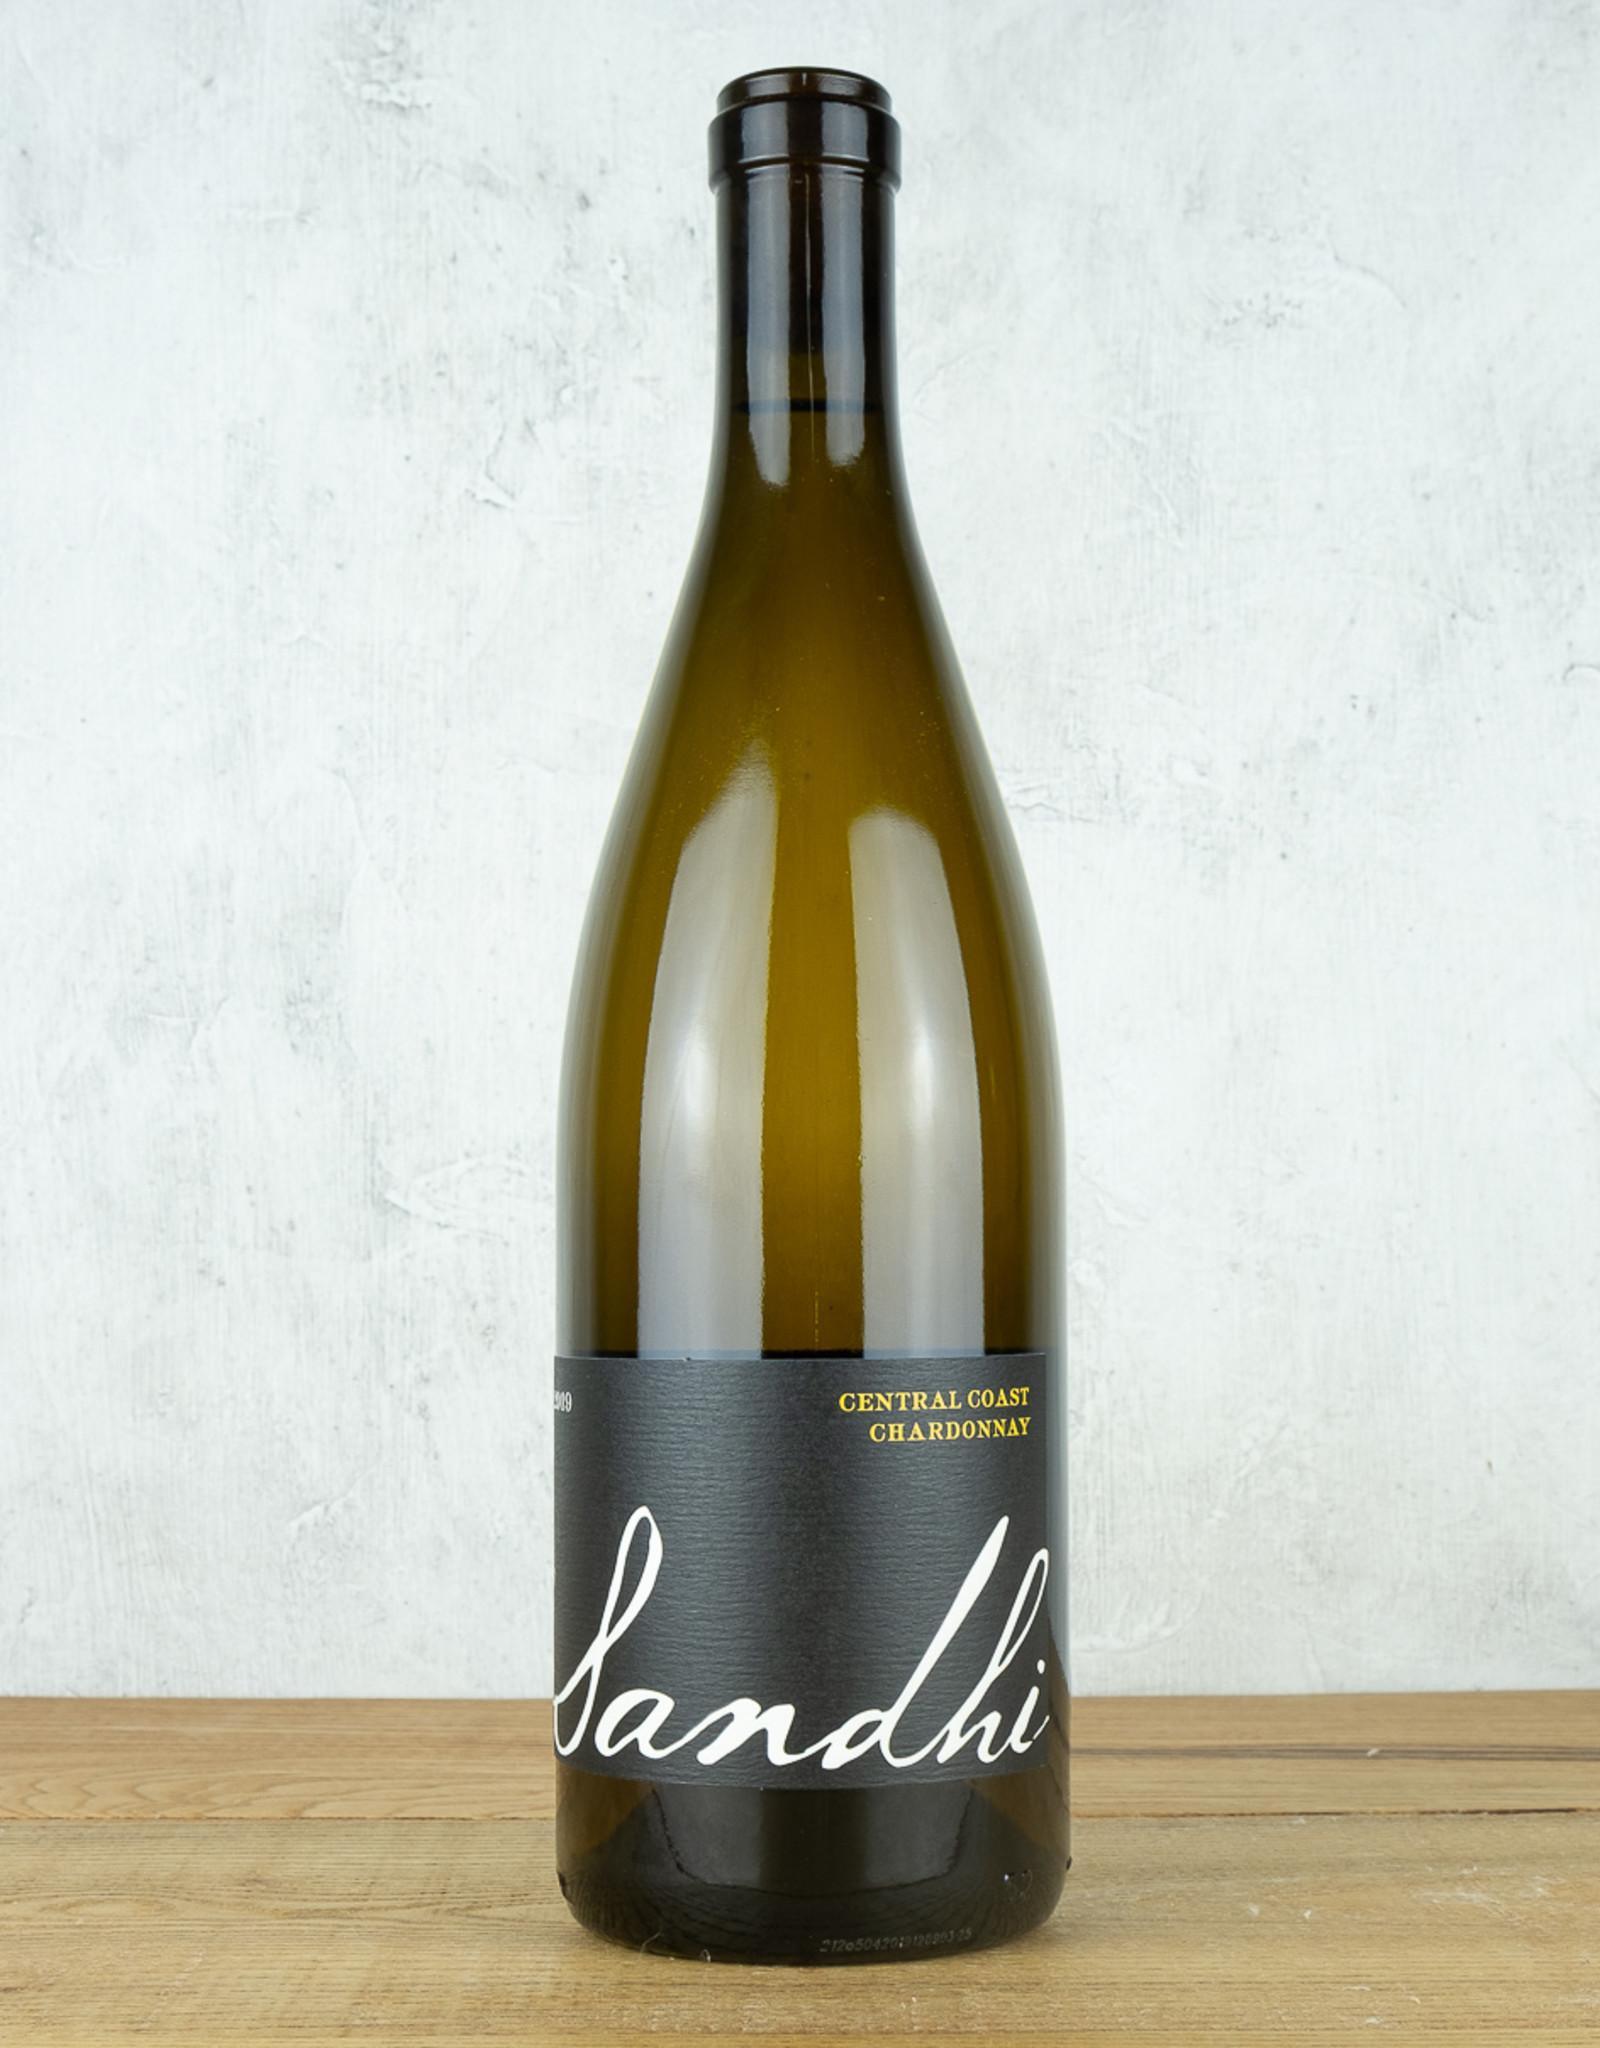 Sandhi Chardonnay Santa Barbara County